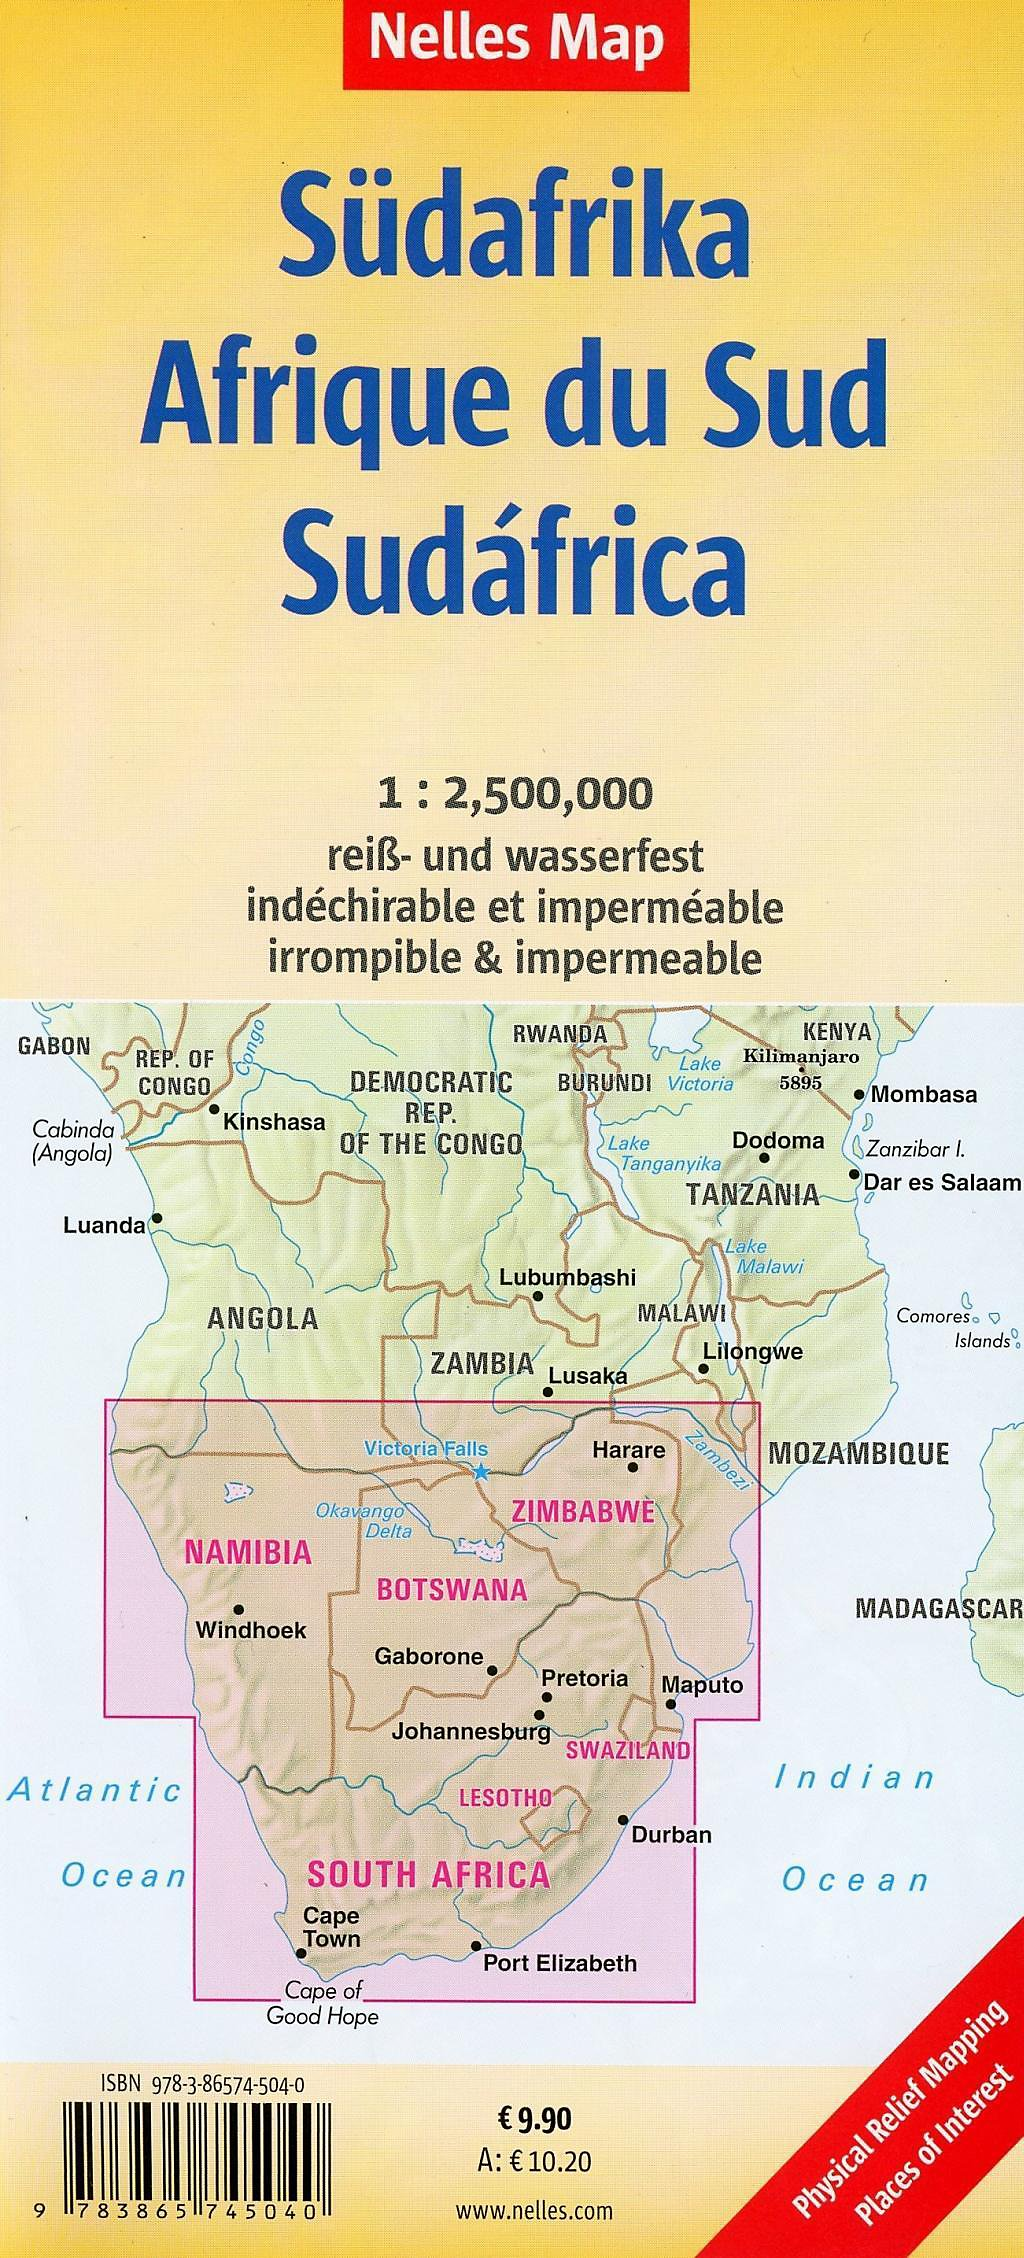 Nelles Map Landkarte South Africa, Namibia, Botswana ...